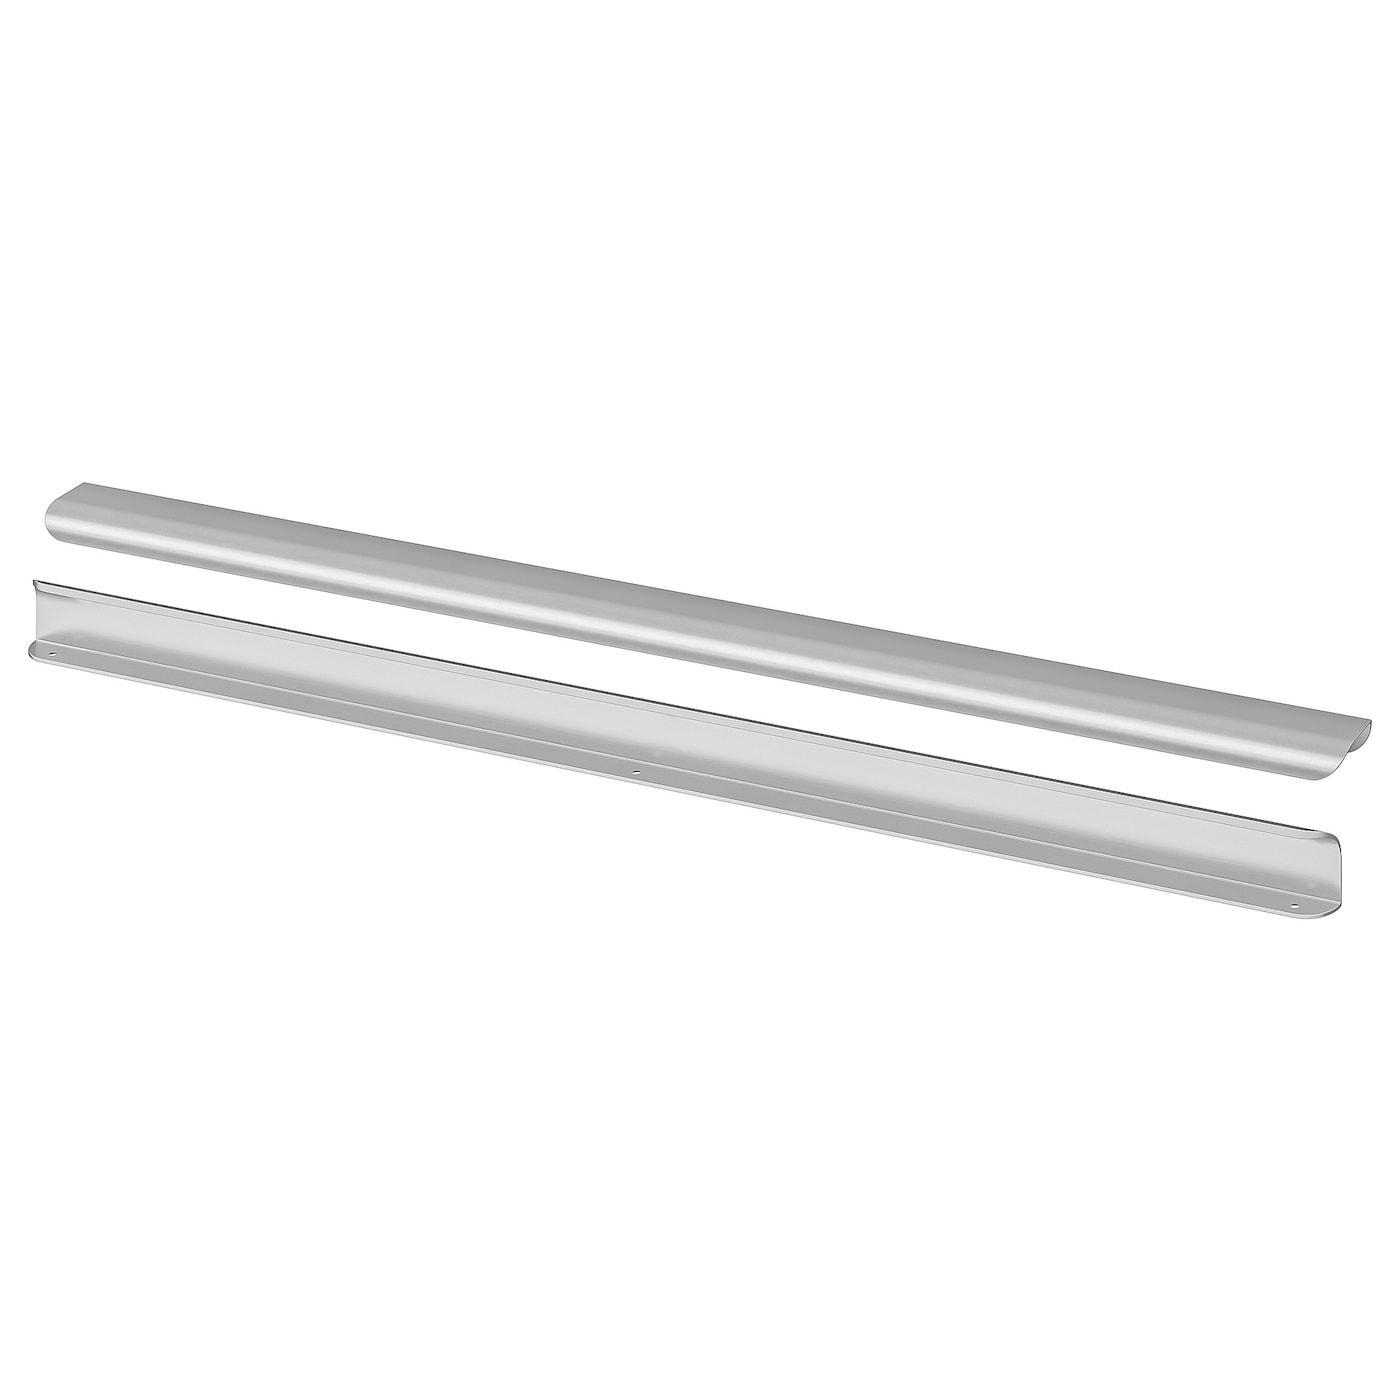 Ikea Osternas tirador piel 65 mm 2 unidades